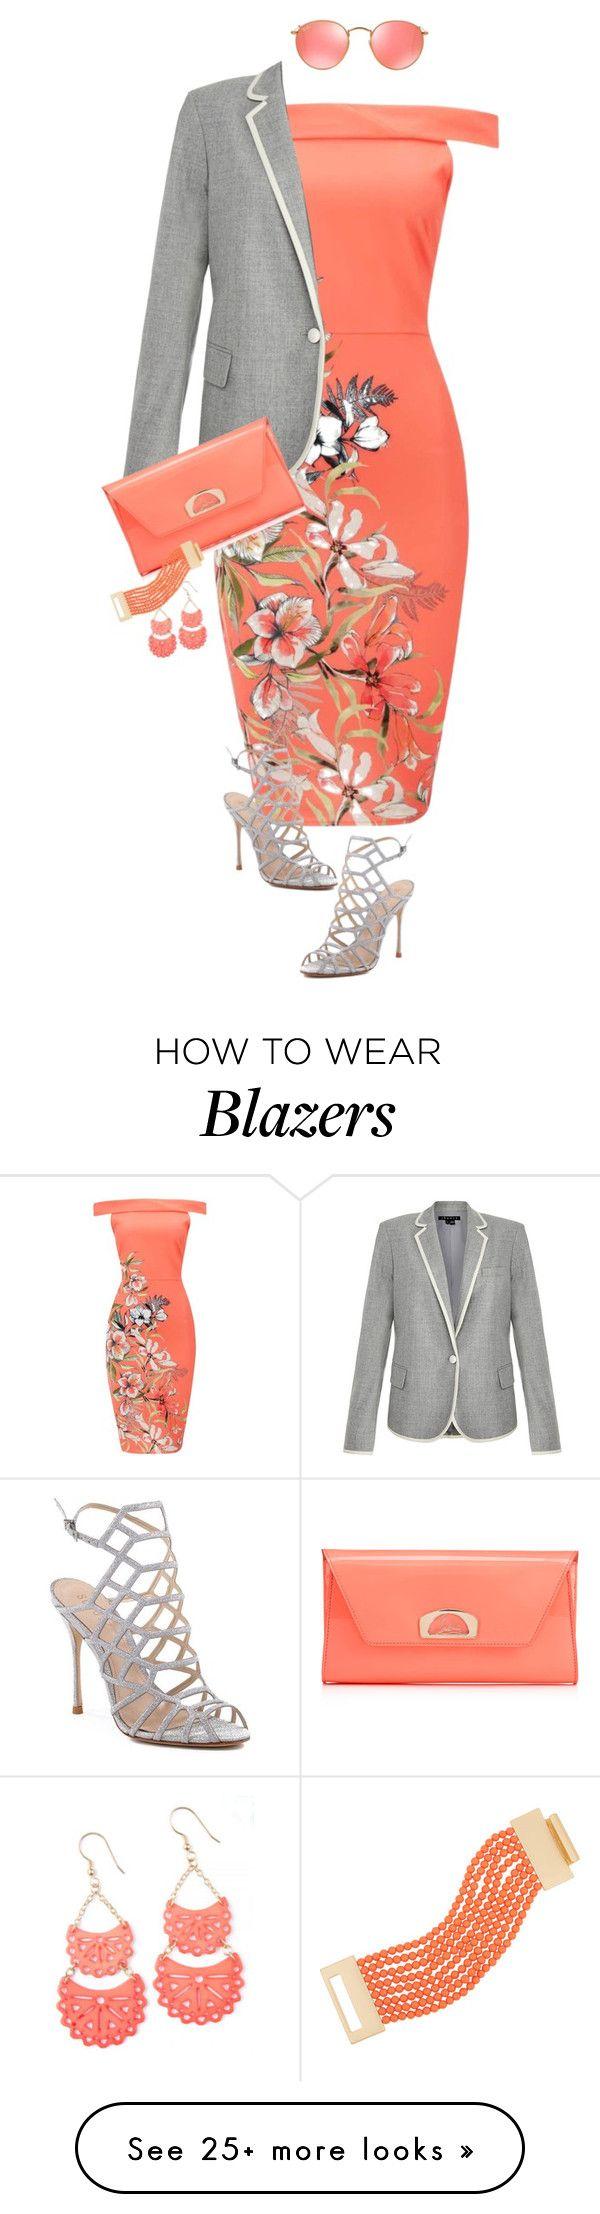 Work attire, how to wear a blazer